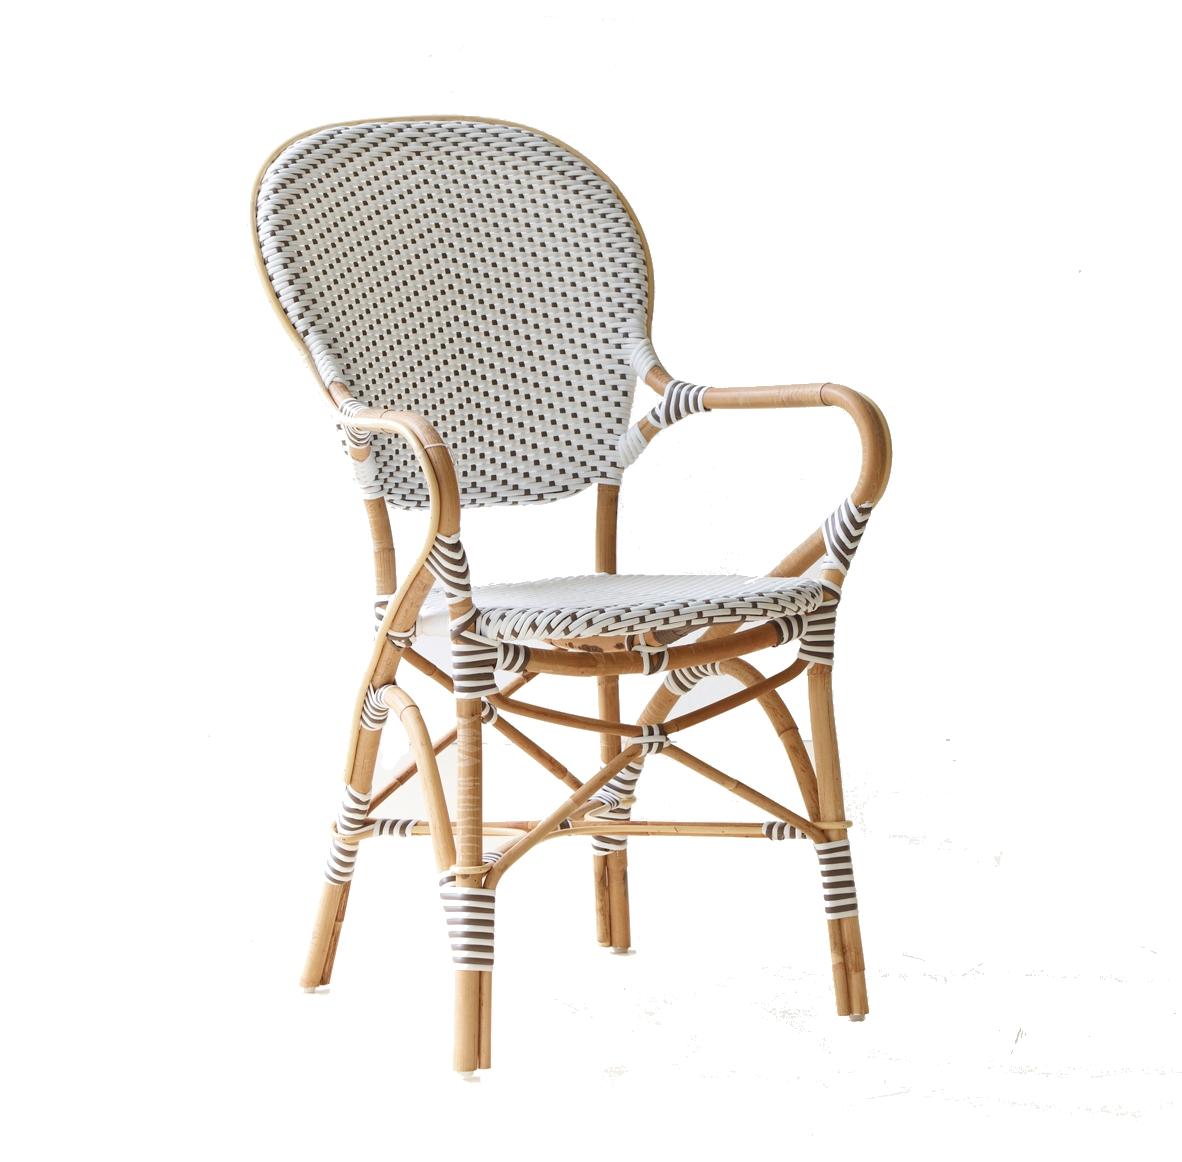 Isabell caféstol karmstol vit, Sika-design